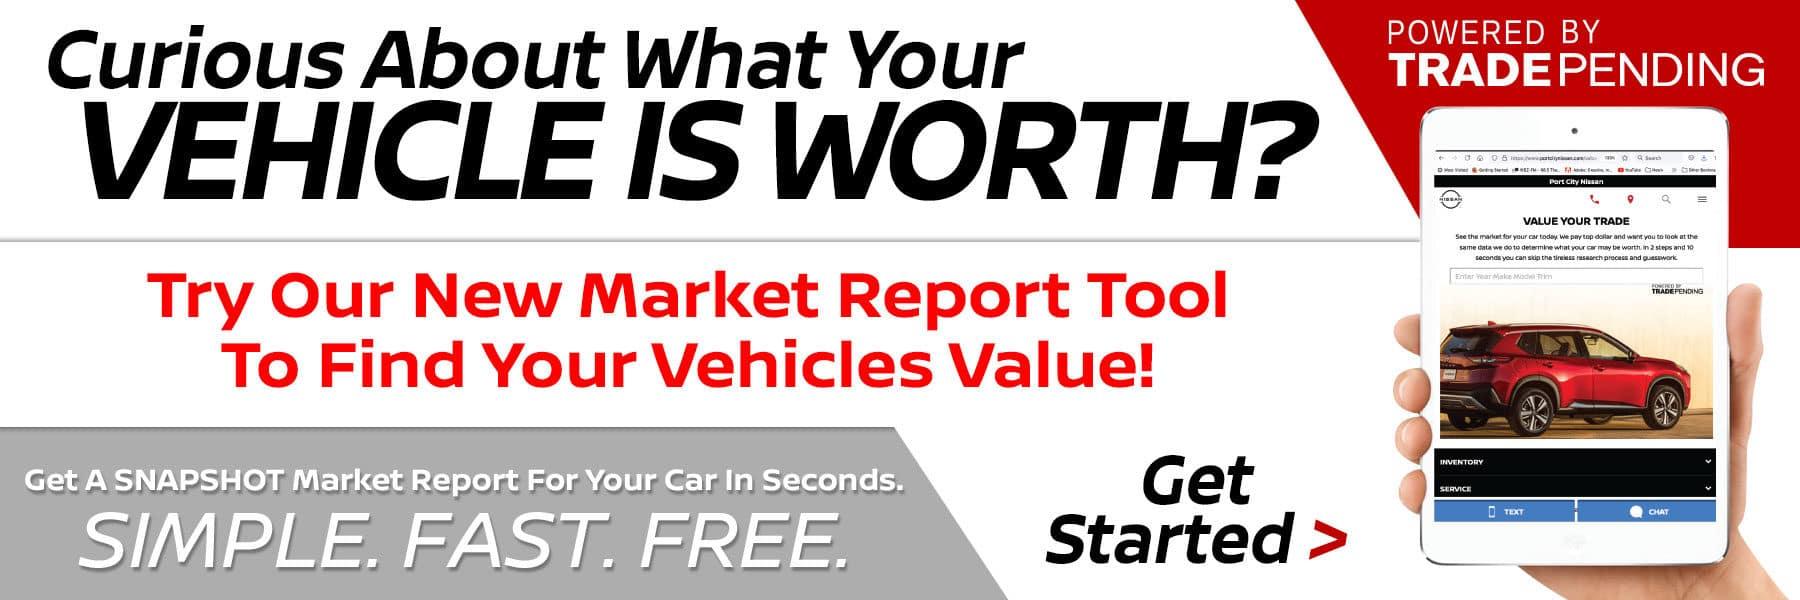 Trade Pending Value Port City Nissan